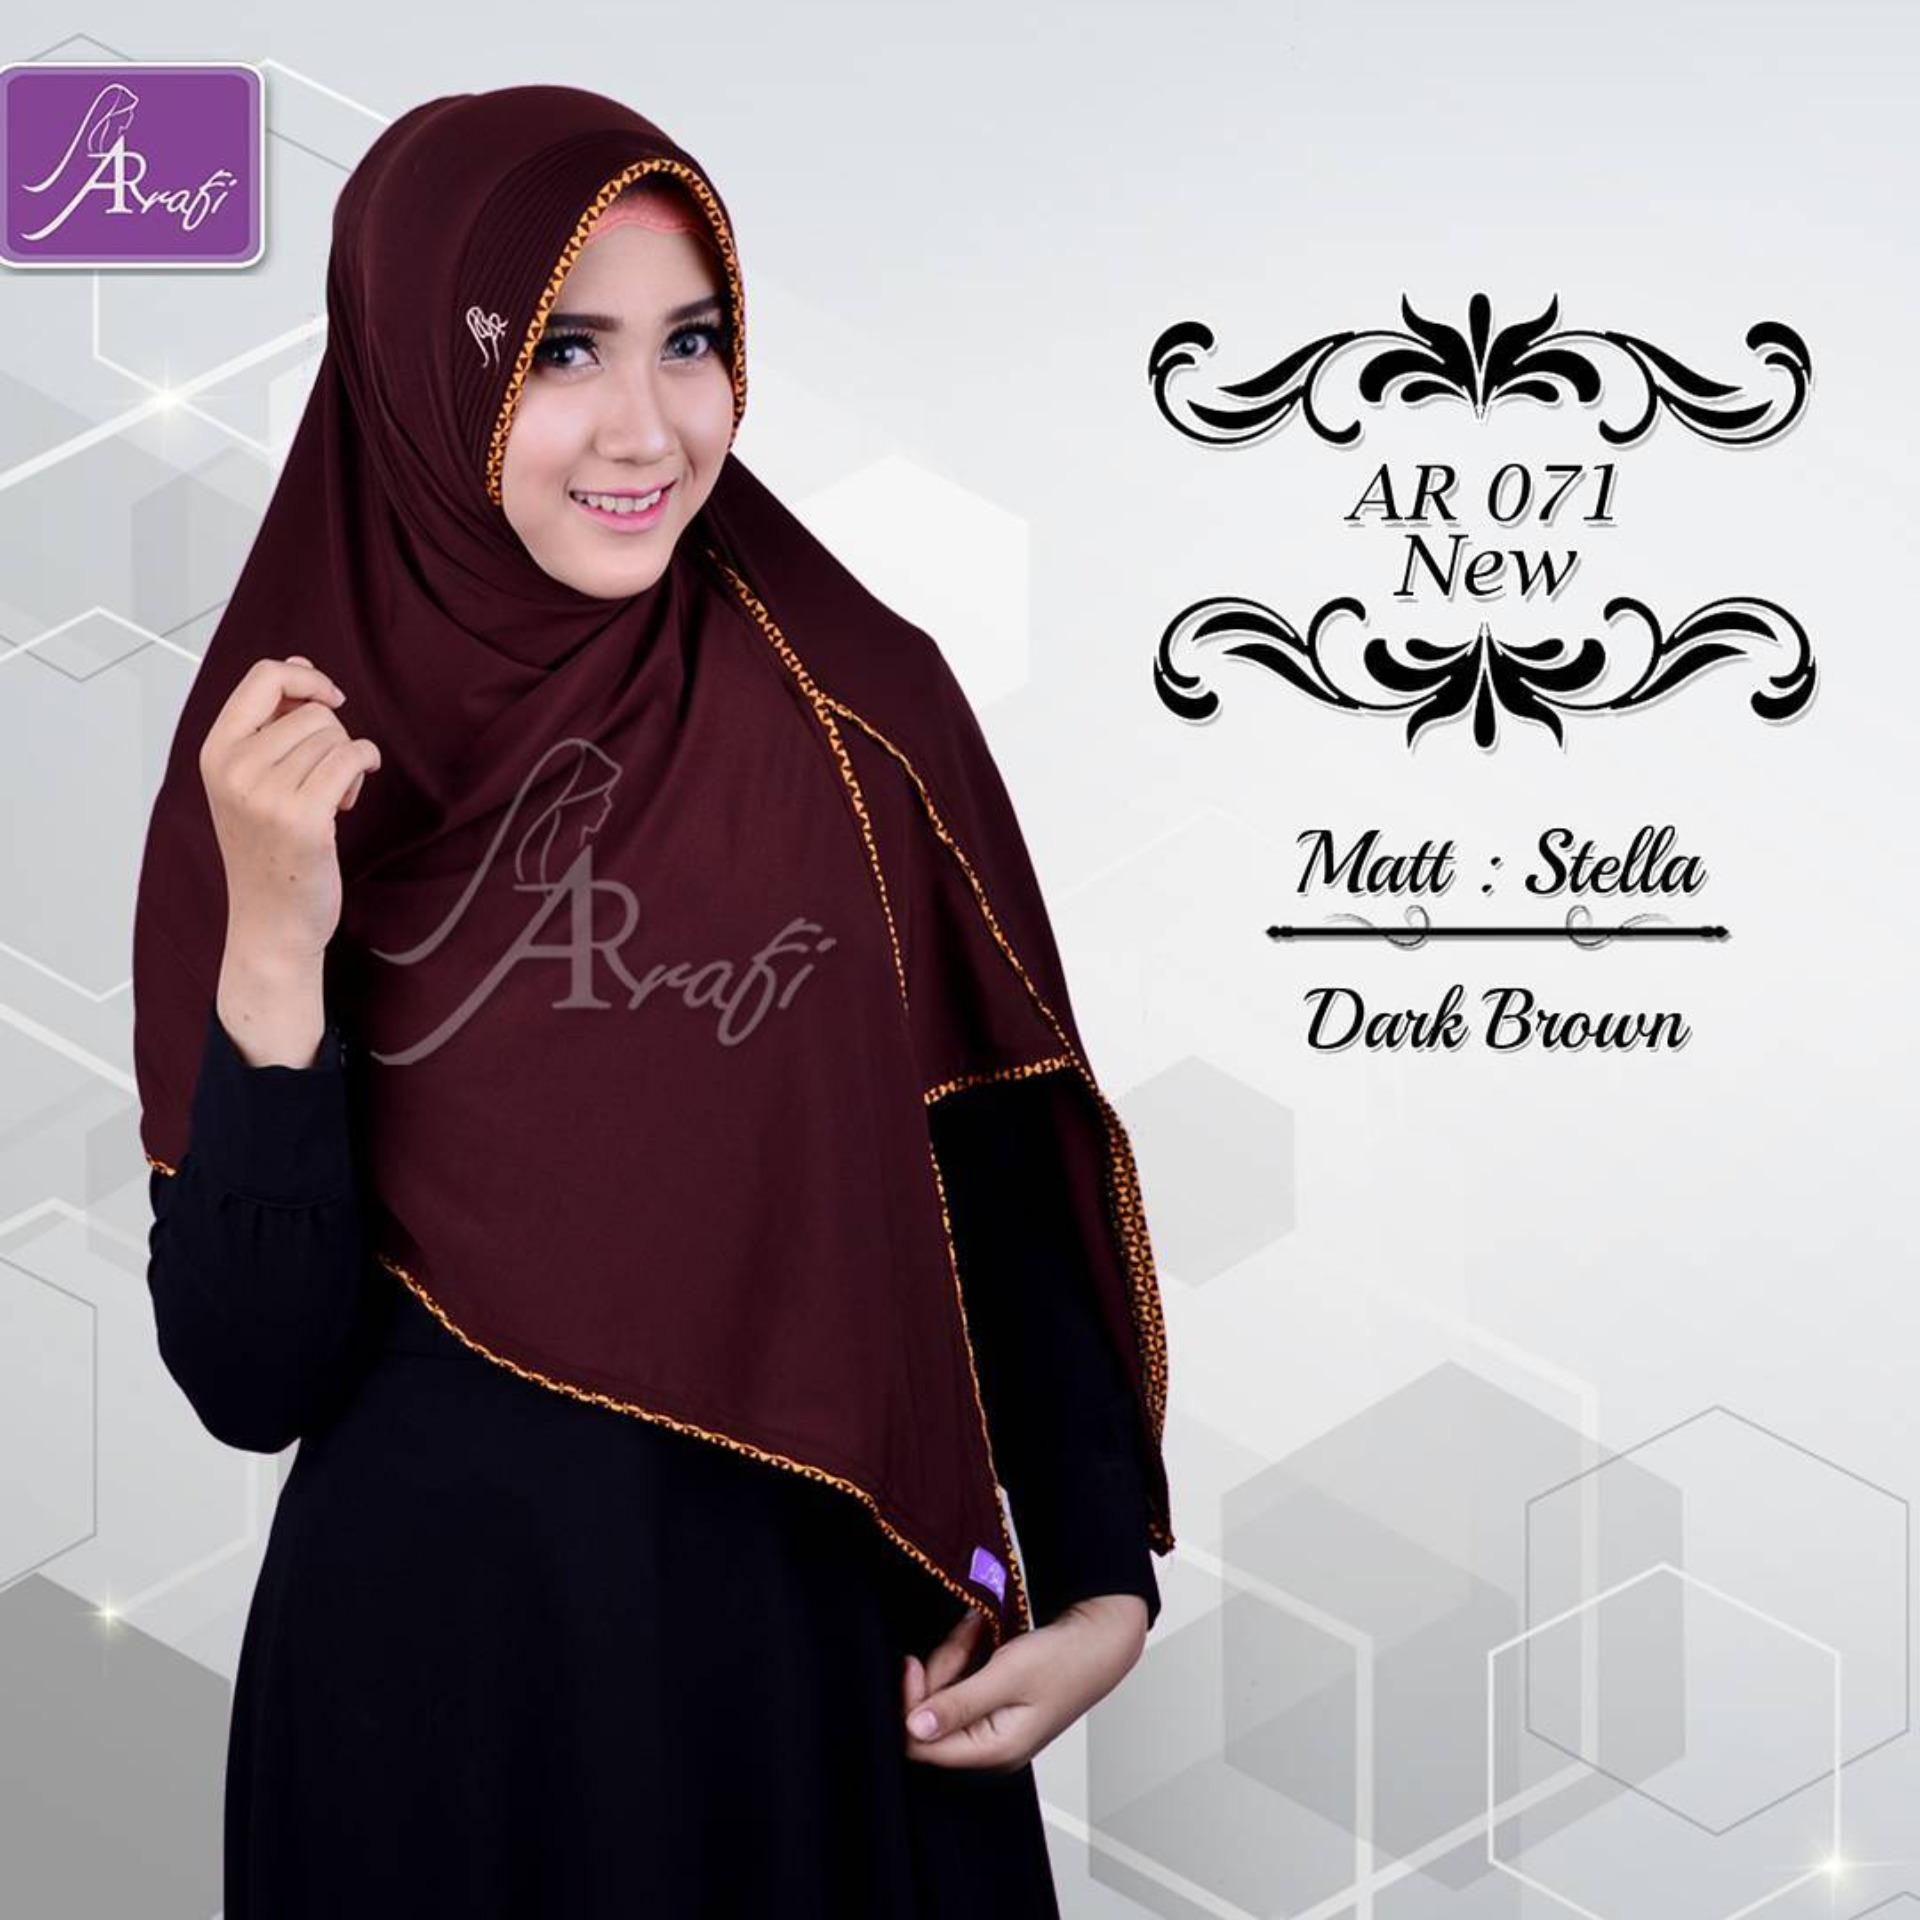 Jual Hijab Instan Arrafi Veena Warna Dark Brown Ar71N Kerudung Jilbab Bergo Termurah